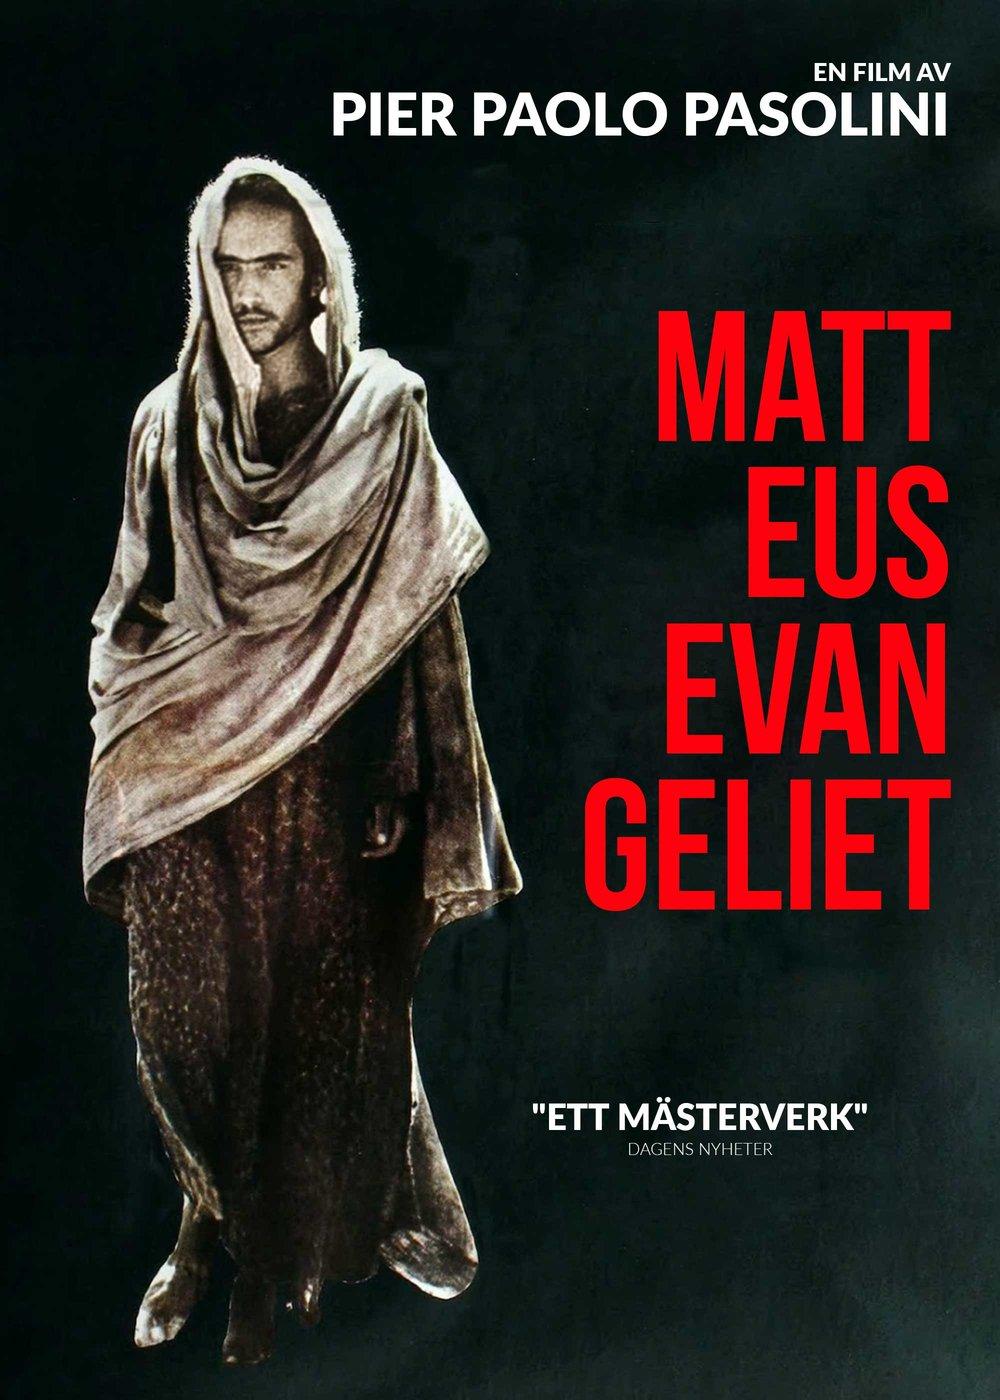 Matteusevangeliet-2000x3000px-svensk.jpg